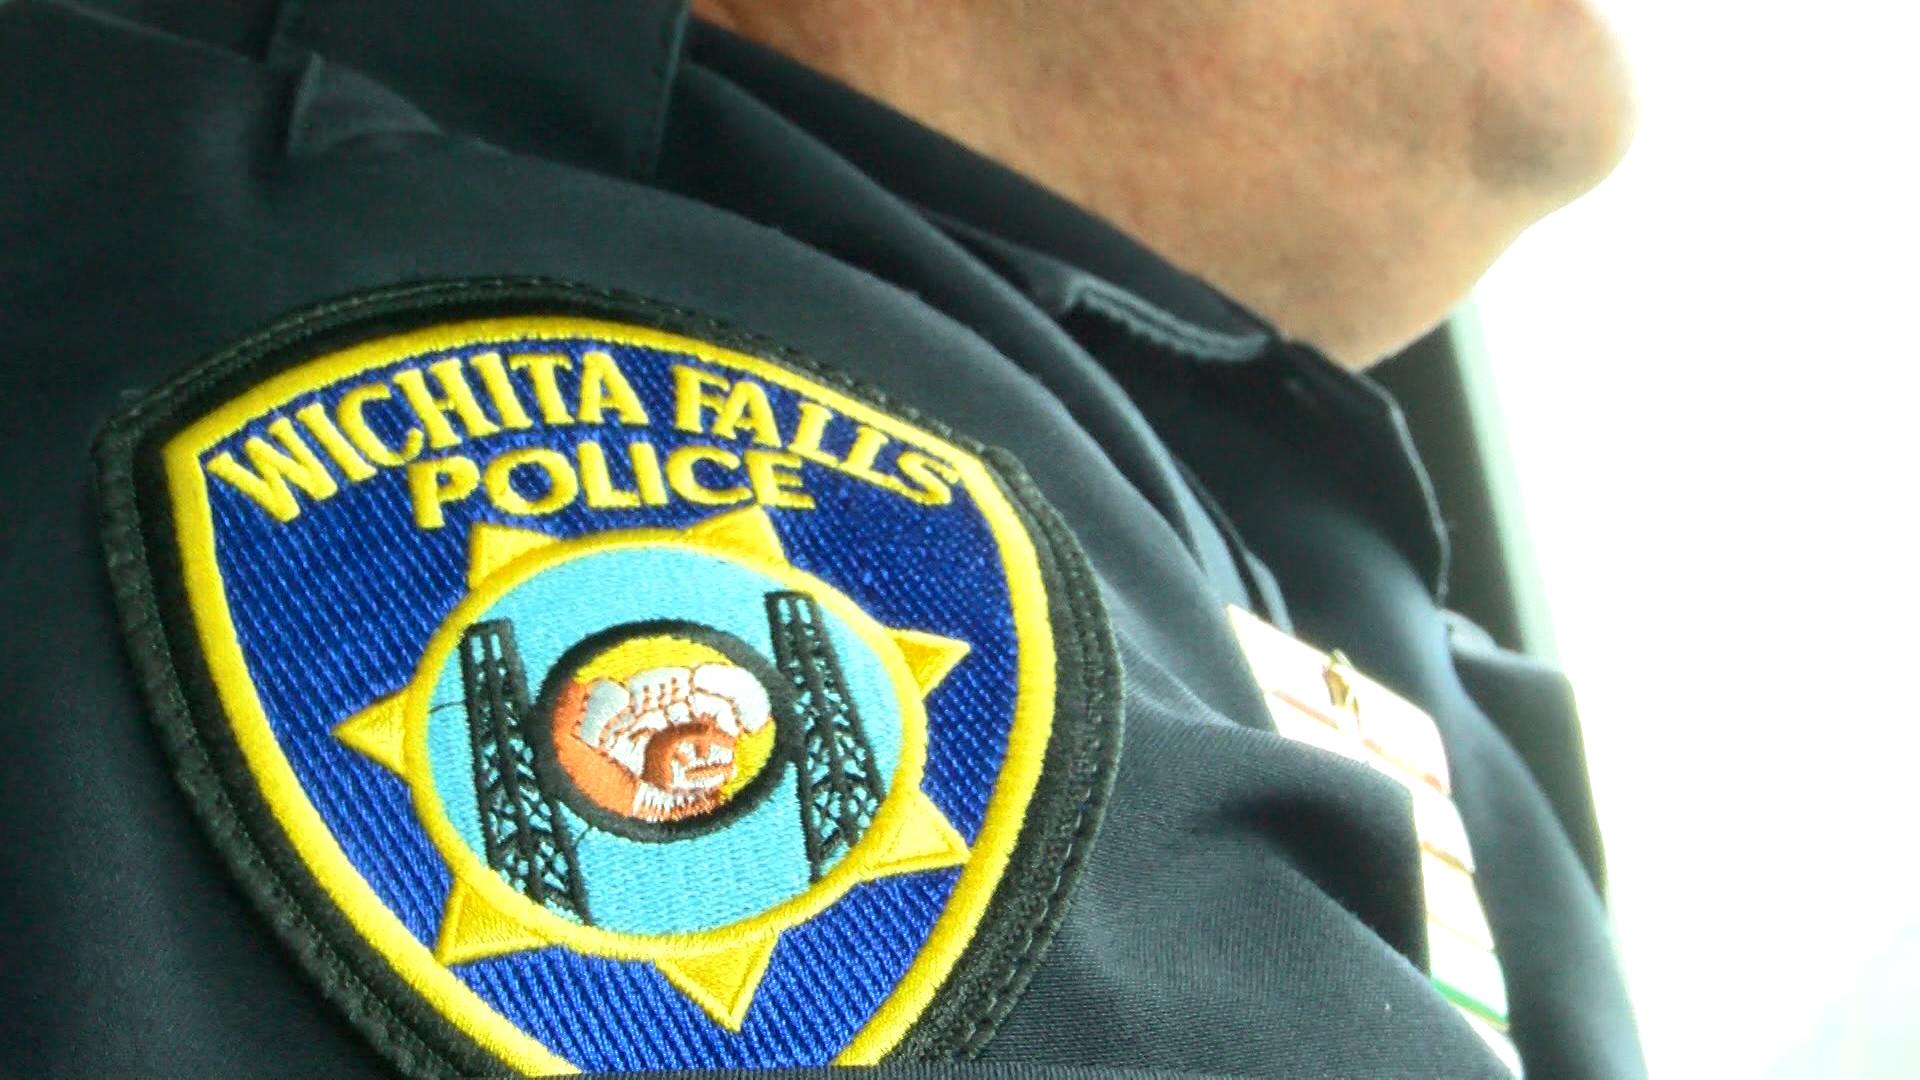 wichita falls police sleeve_1536712994408.jpg.jpg